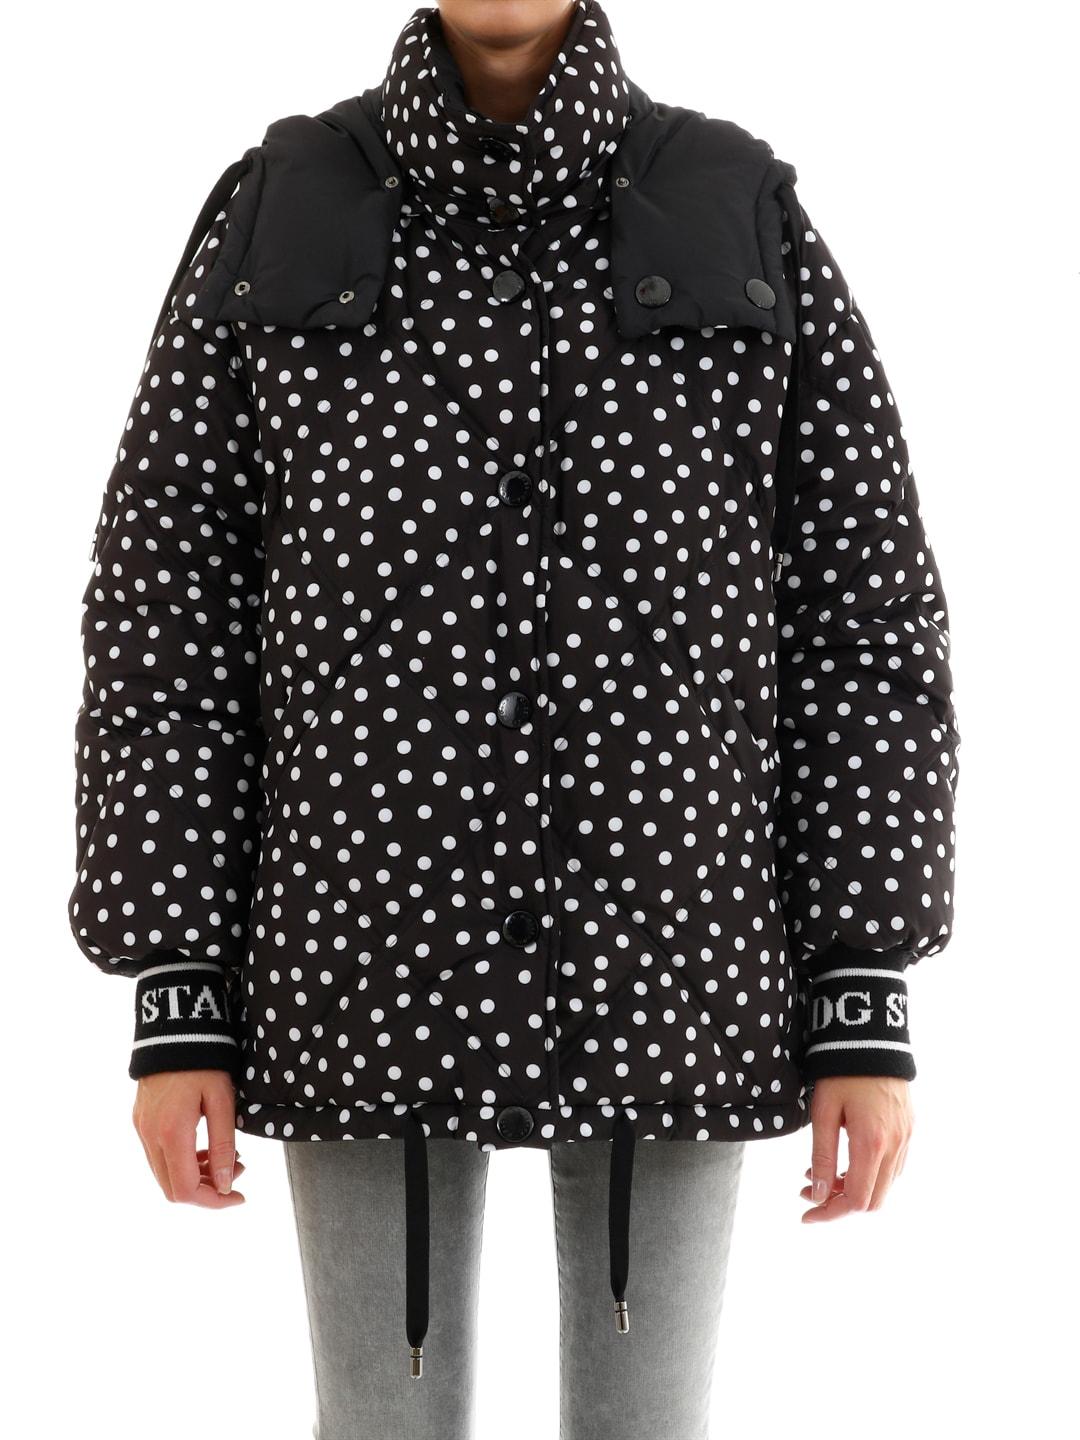 Dolce & Gabbana Reversible Overcoat